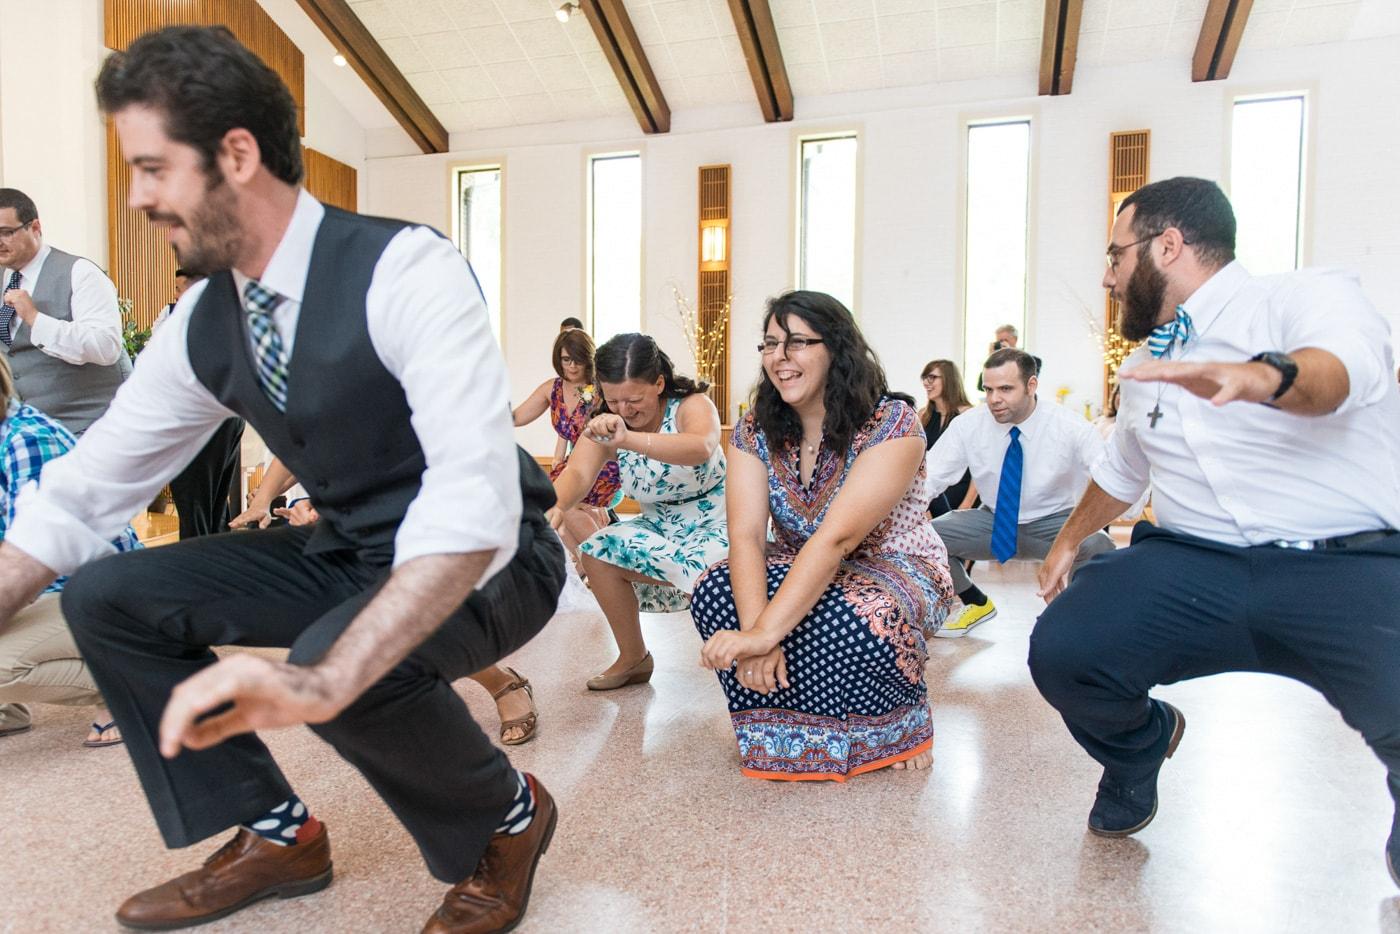 Guests dancing and having fun at a wedding reception at St. Mark Catholic Church in Vienna, Virginia